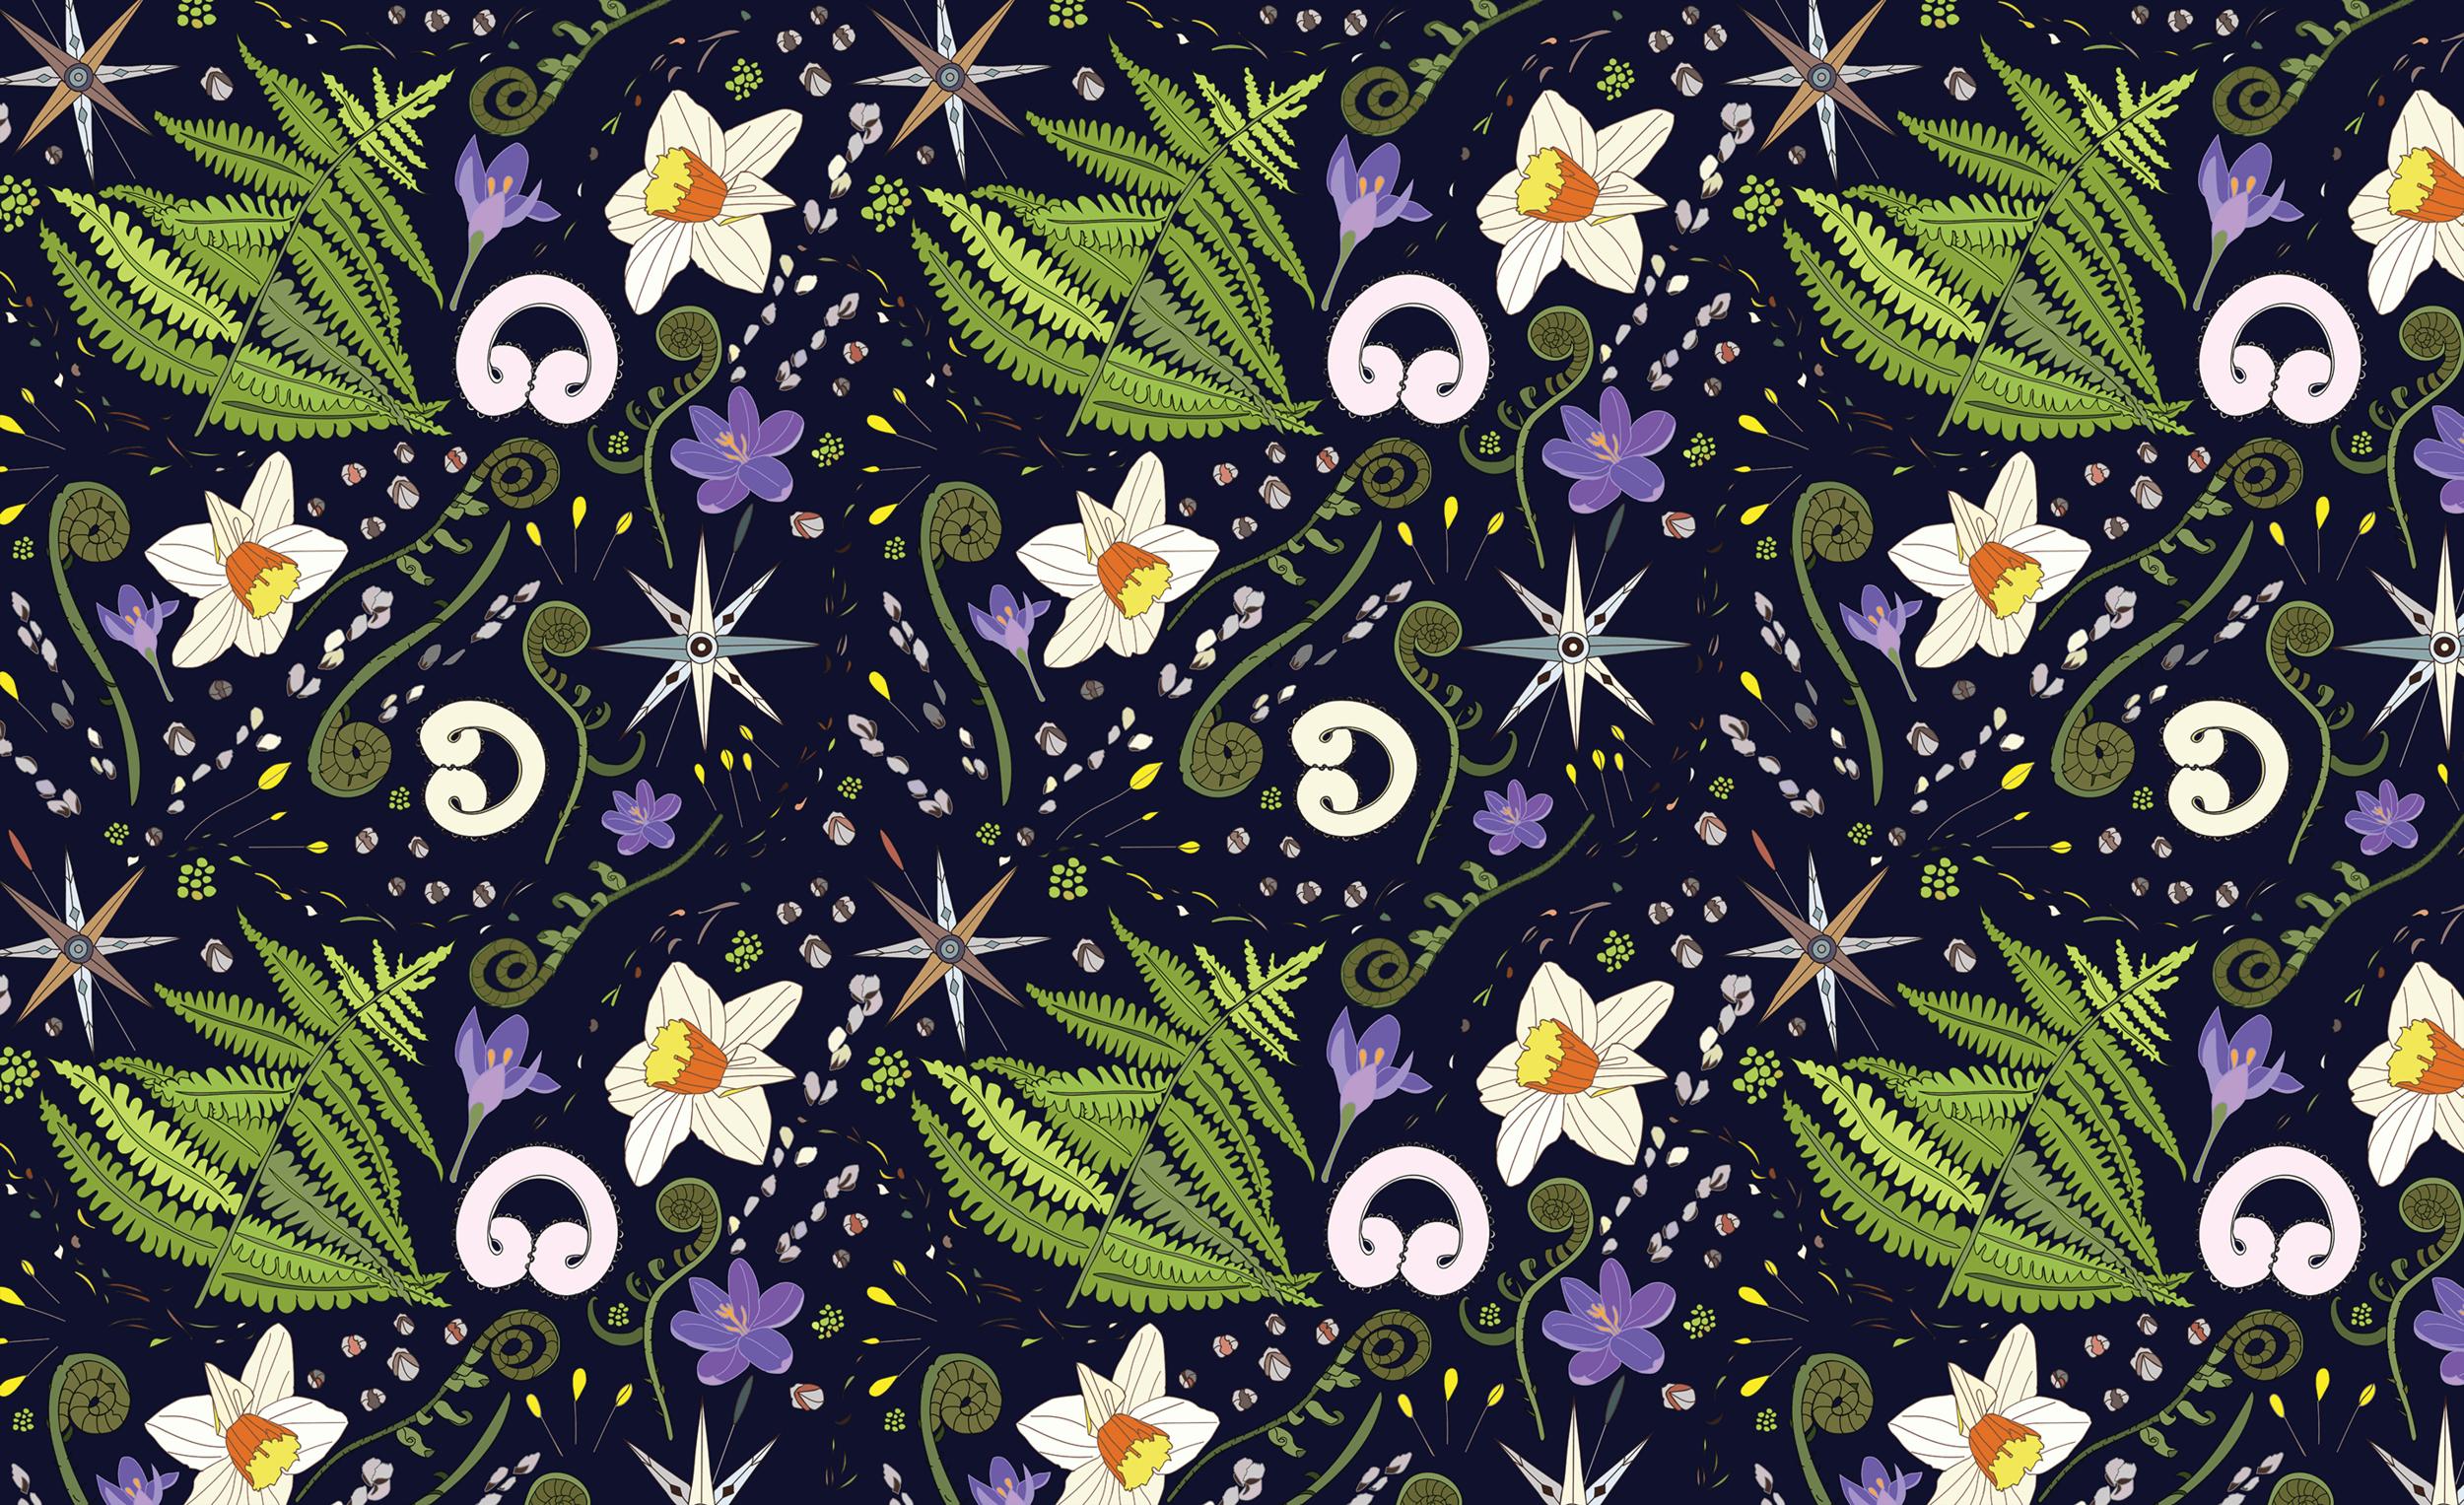 Repeat Pattern in Dark